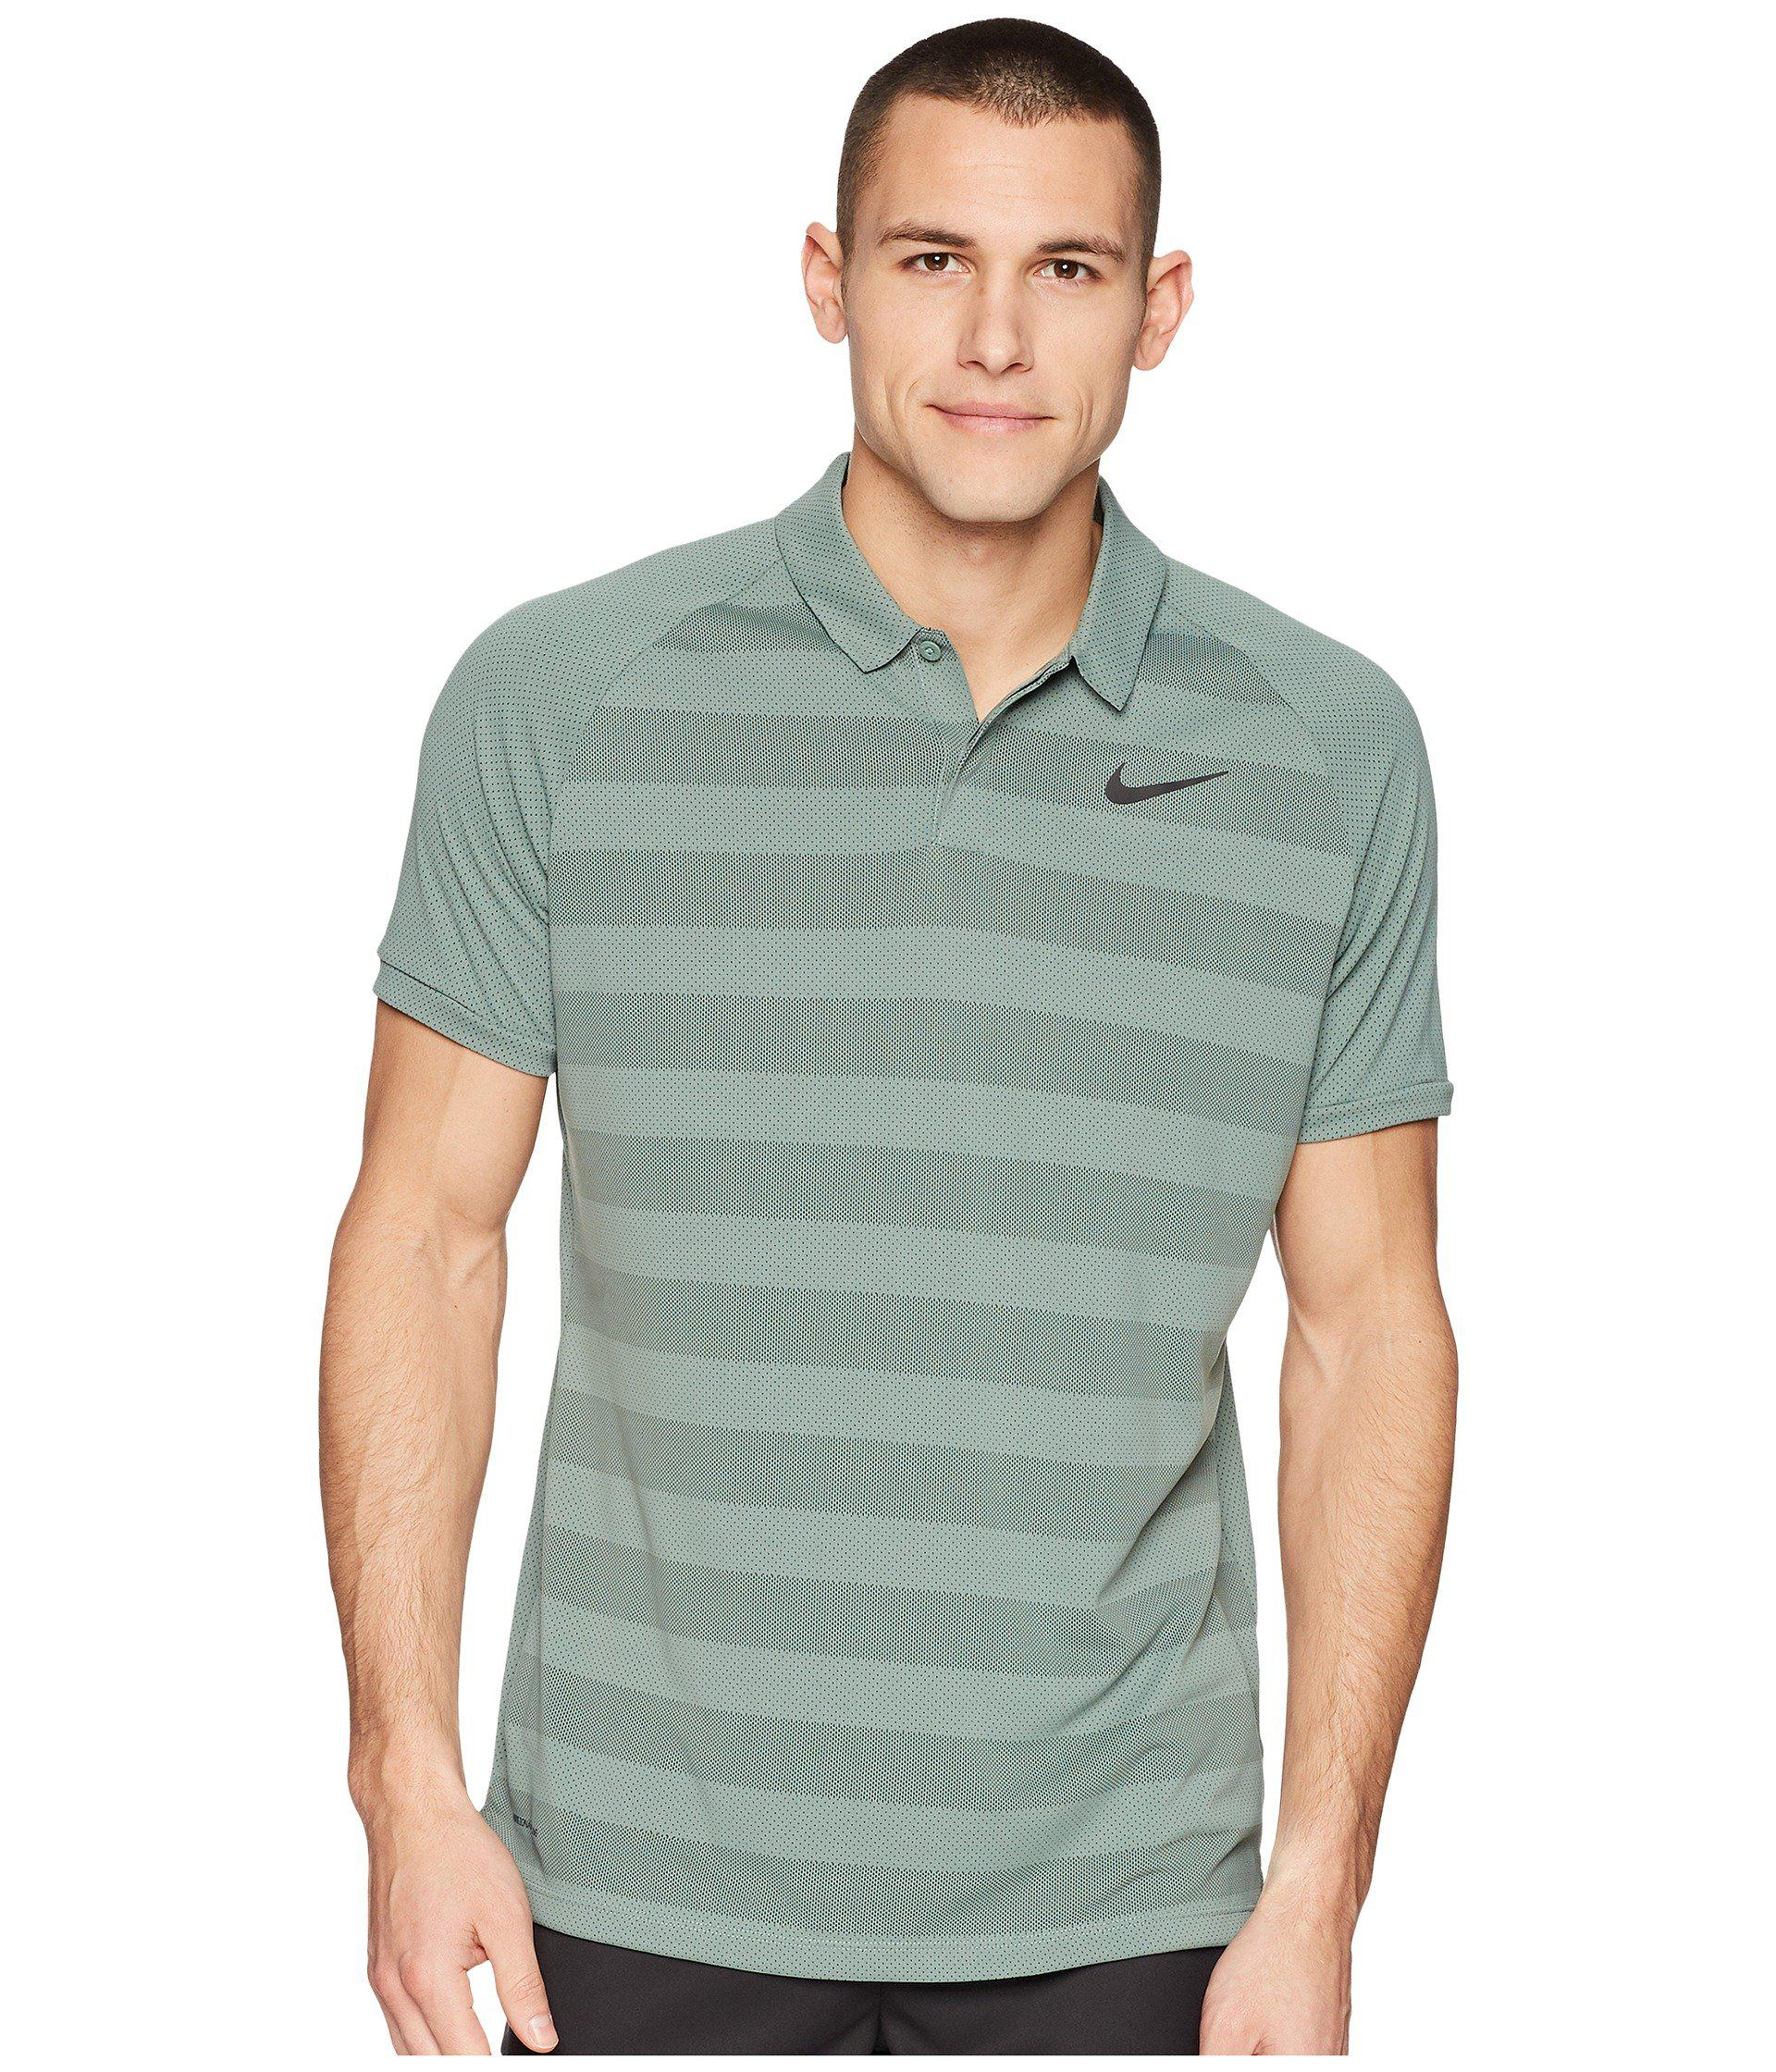 961b31f937 Nike Stripe Polo Shirt Mens | Top Mode Depot